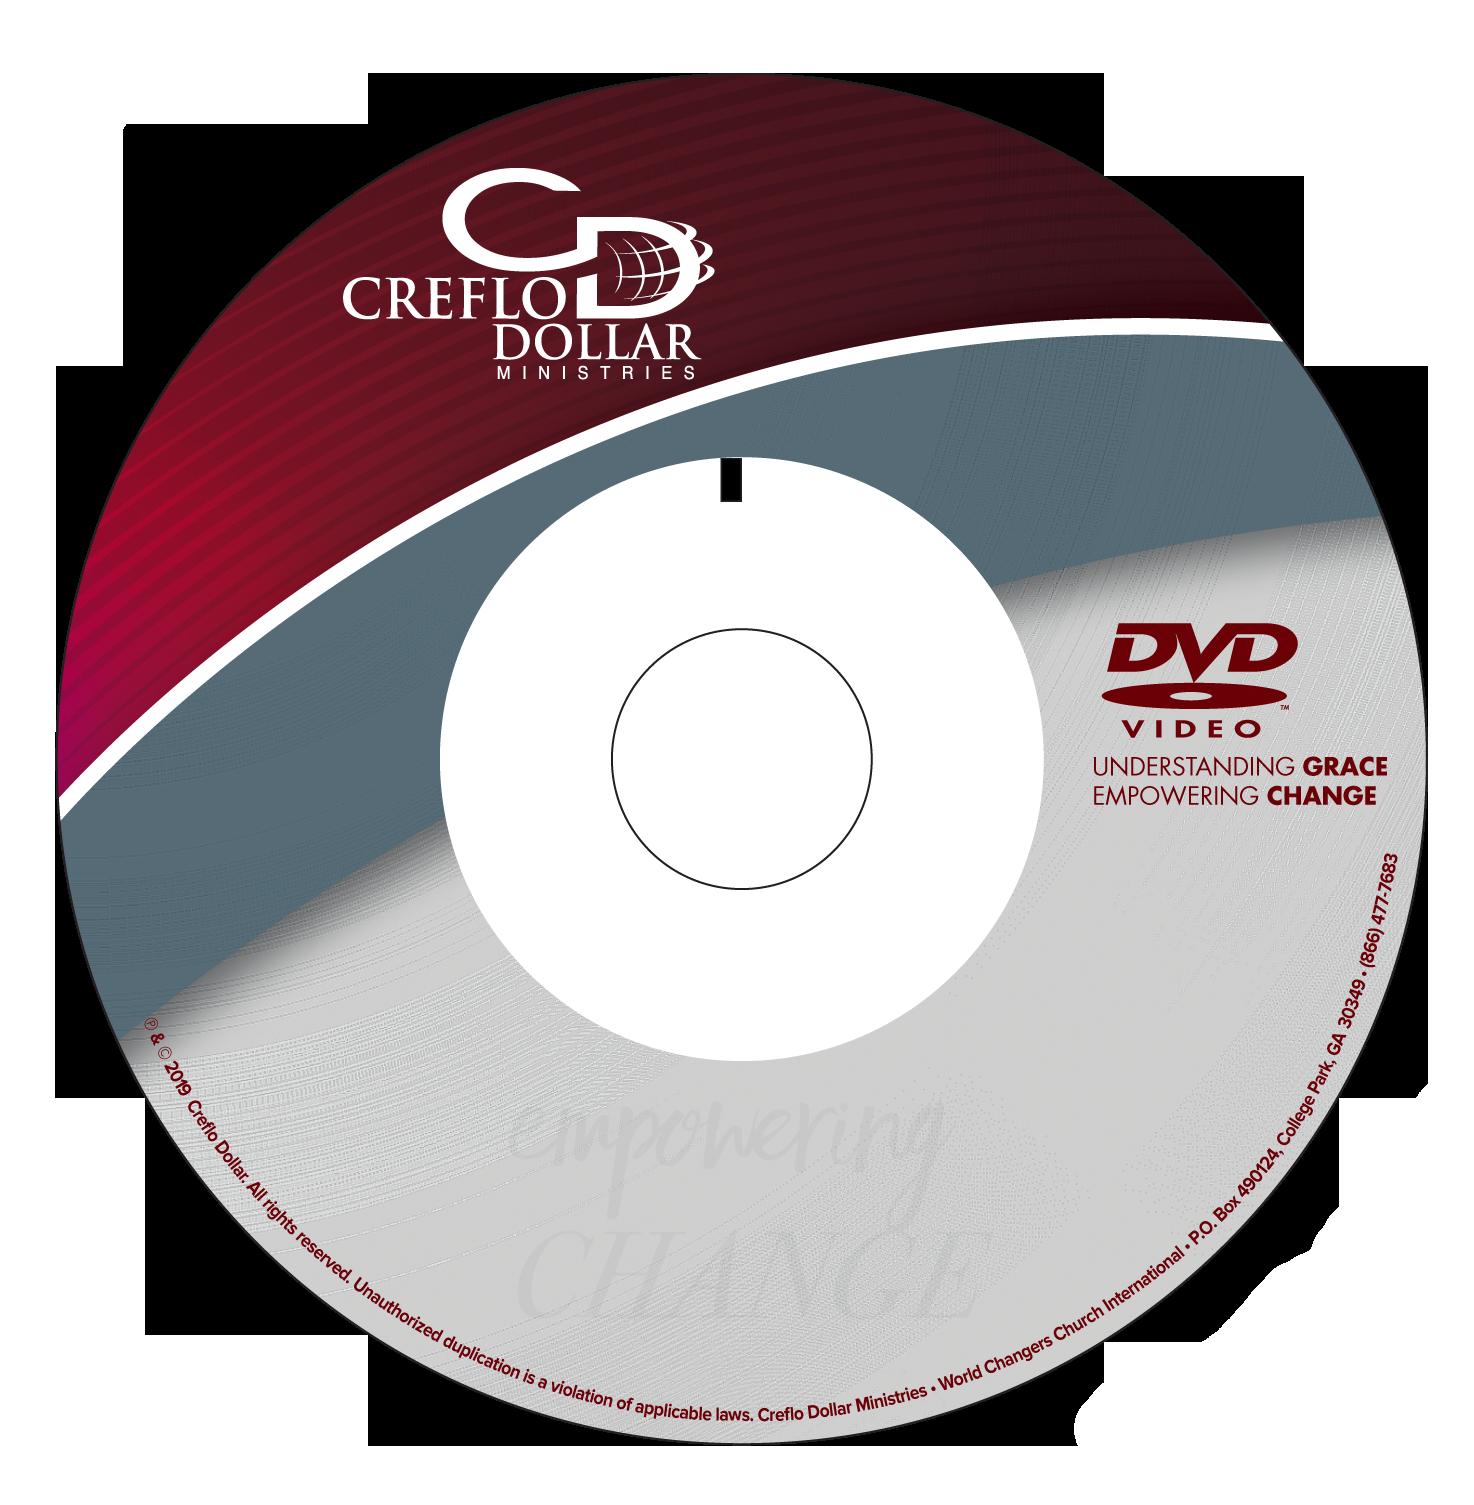 050519 Sunday Service DVD 10AM